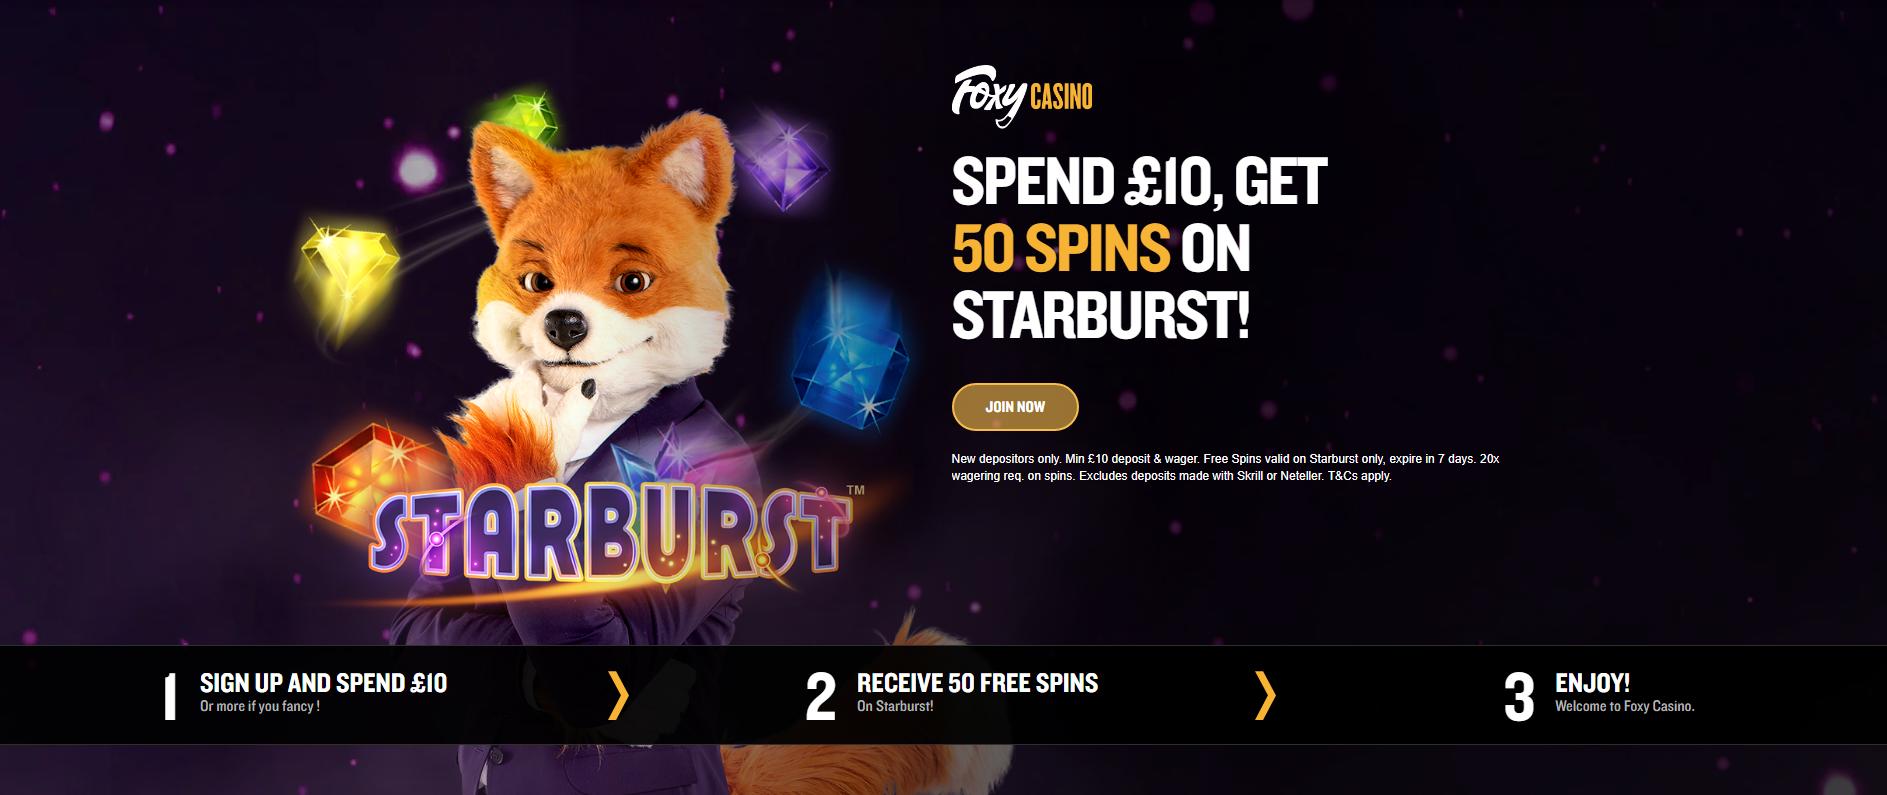 Casino New Customer Offers